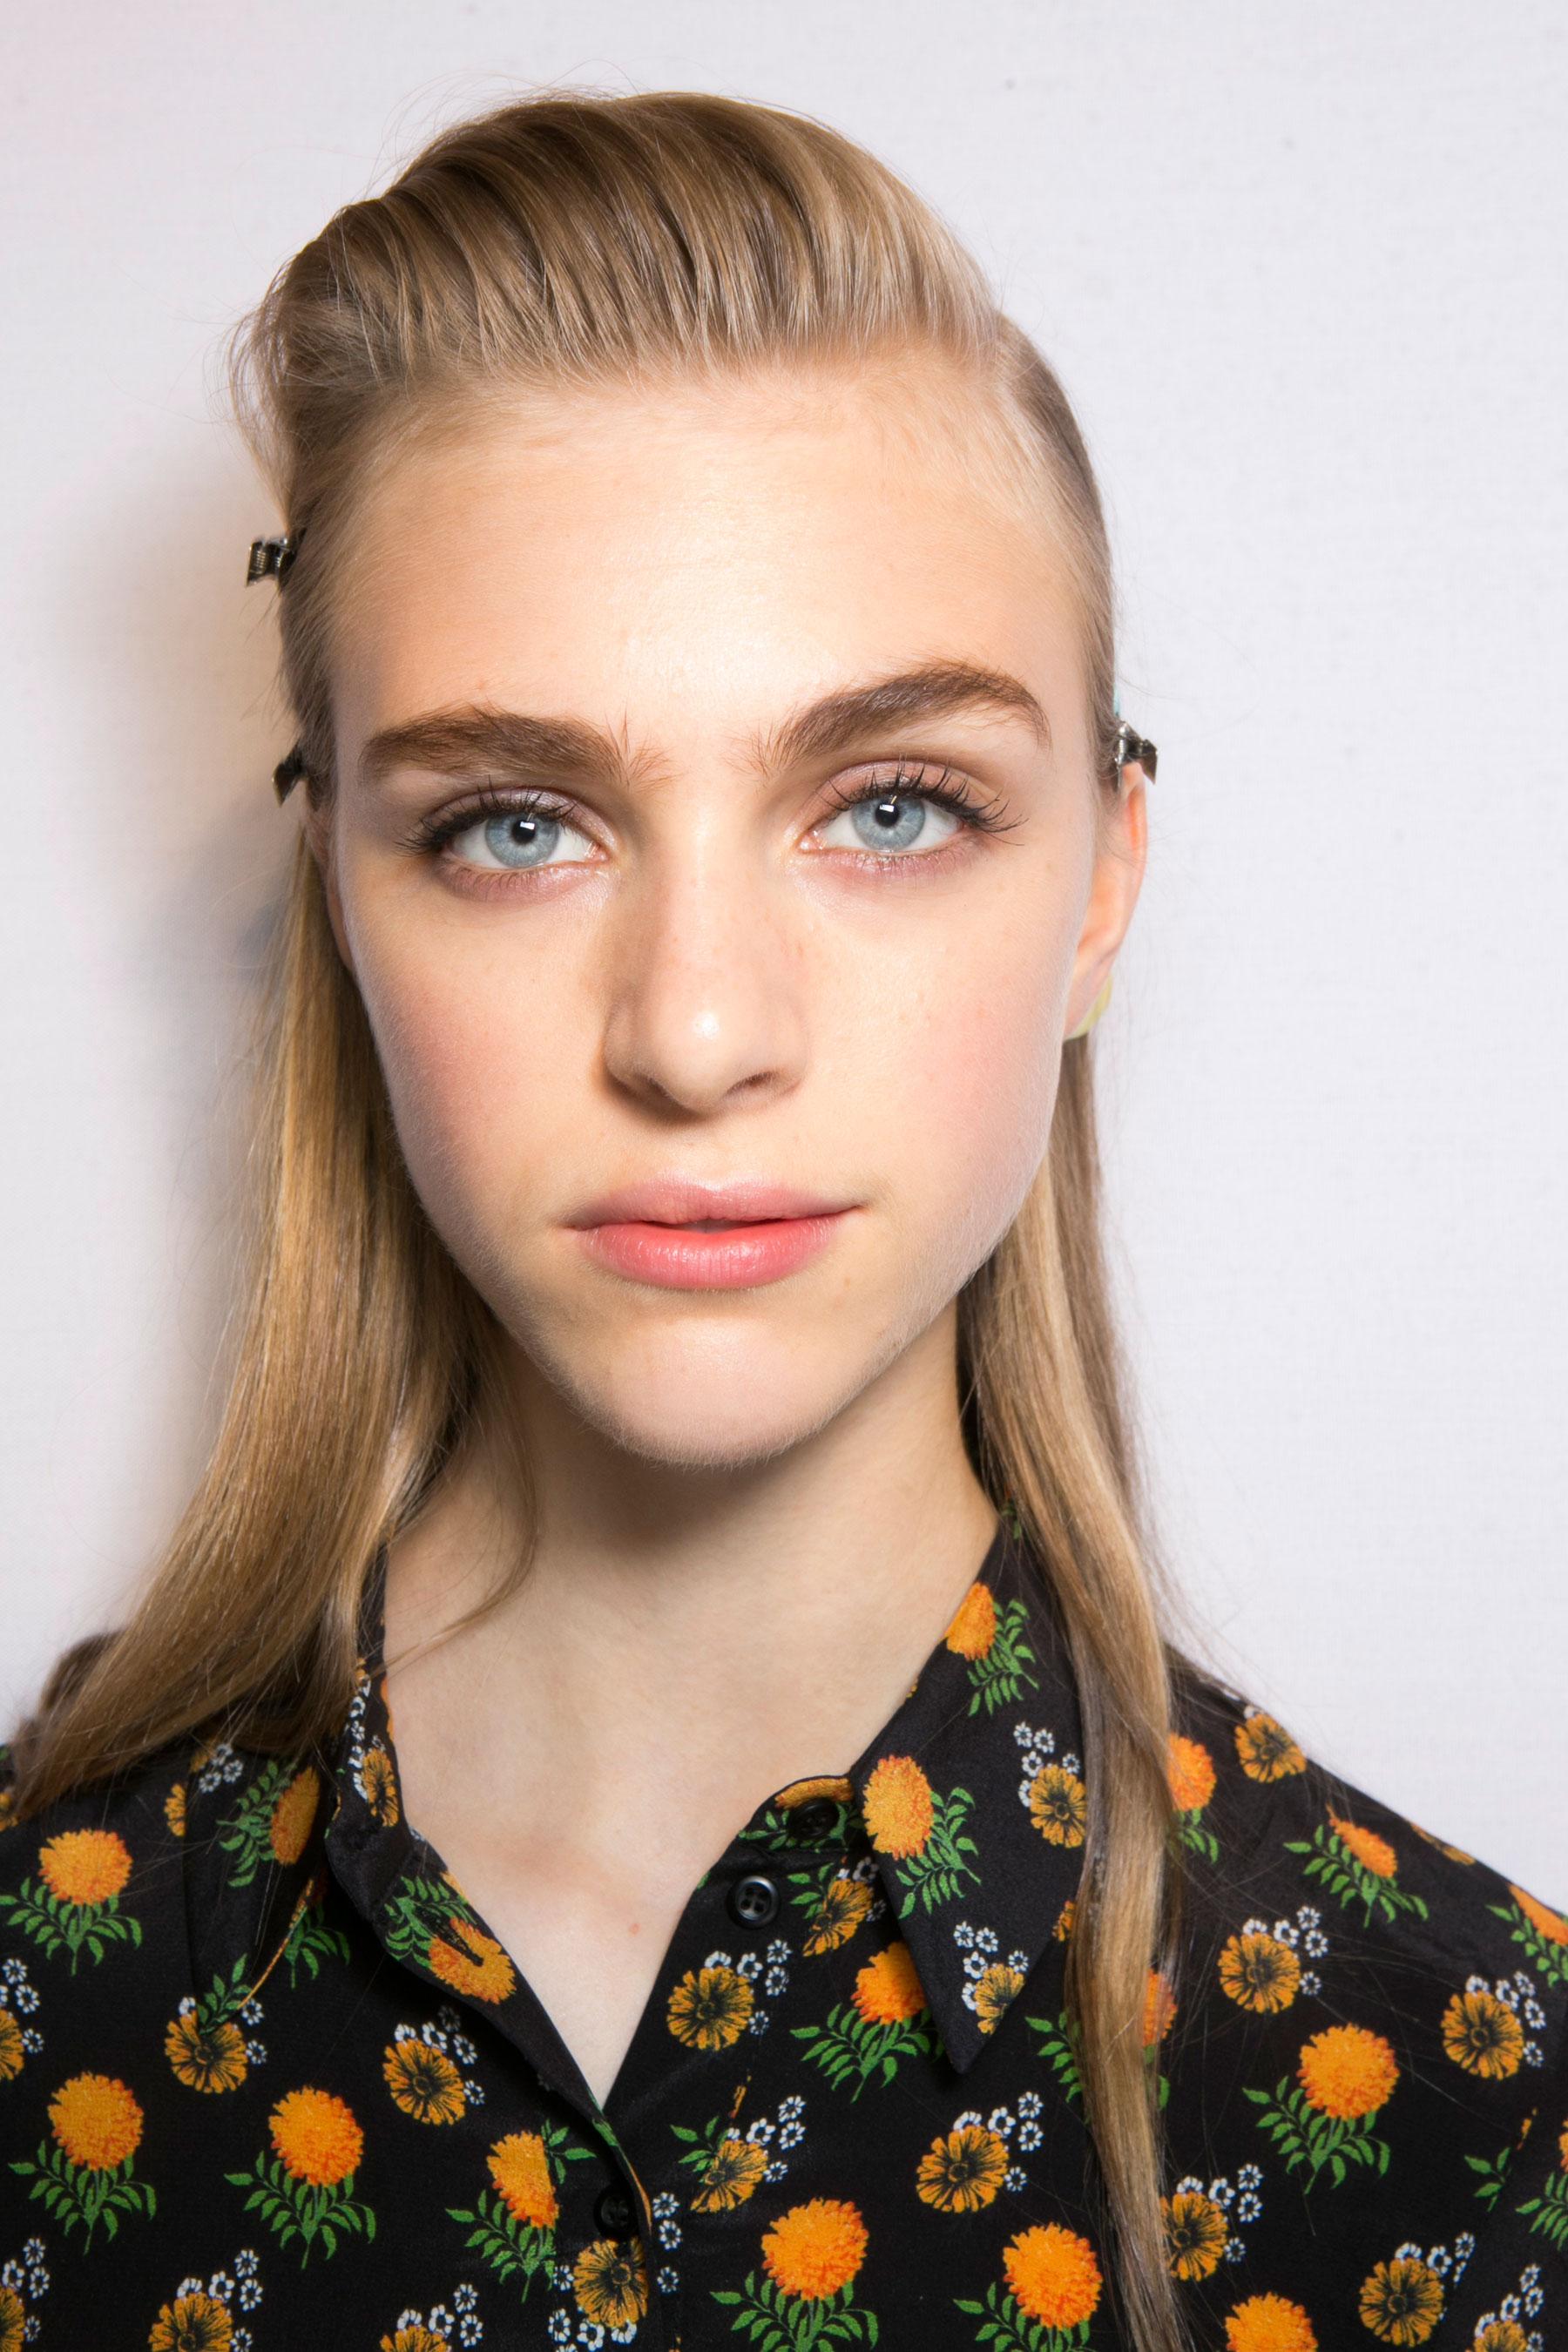 Roberto-Cavalli-Backstage-beauty-spring-2016-close-up-fashion-show-the-impression-013